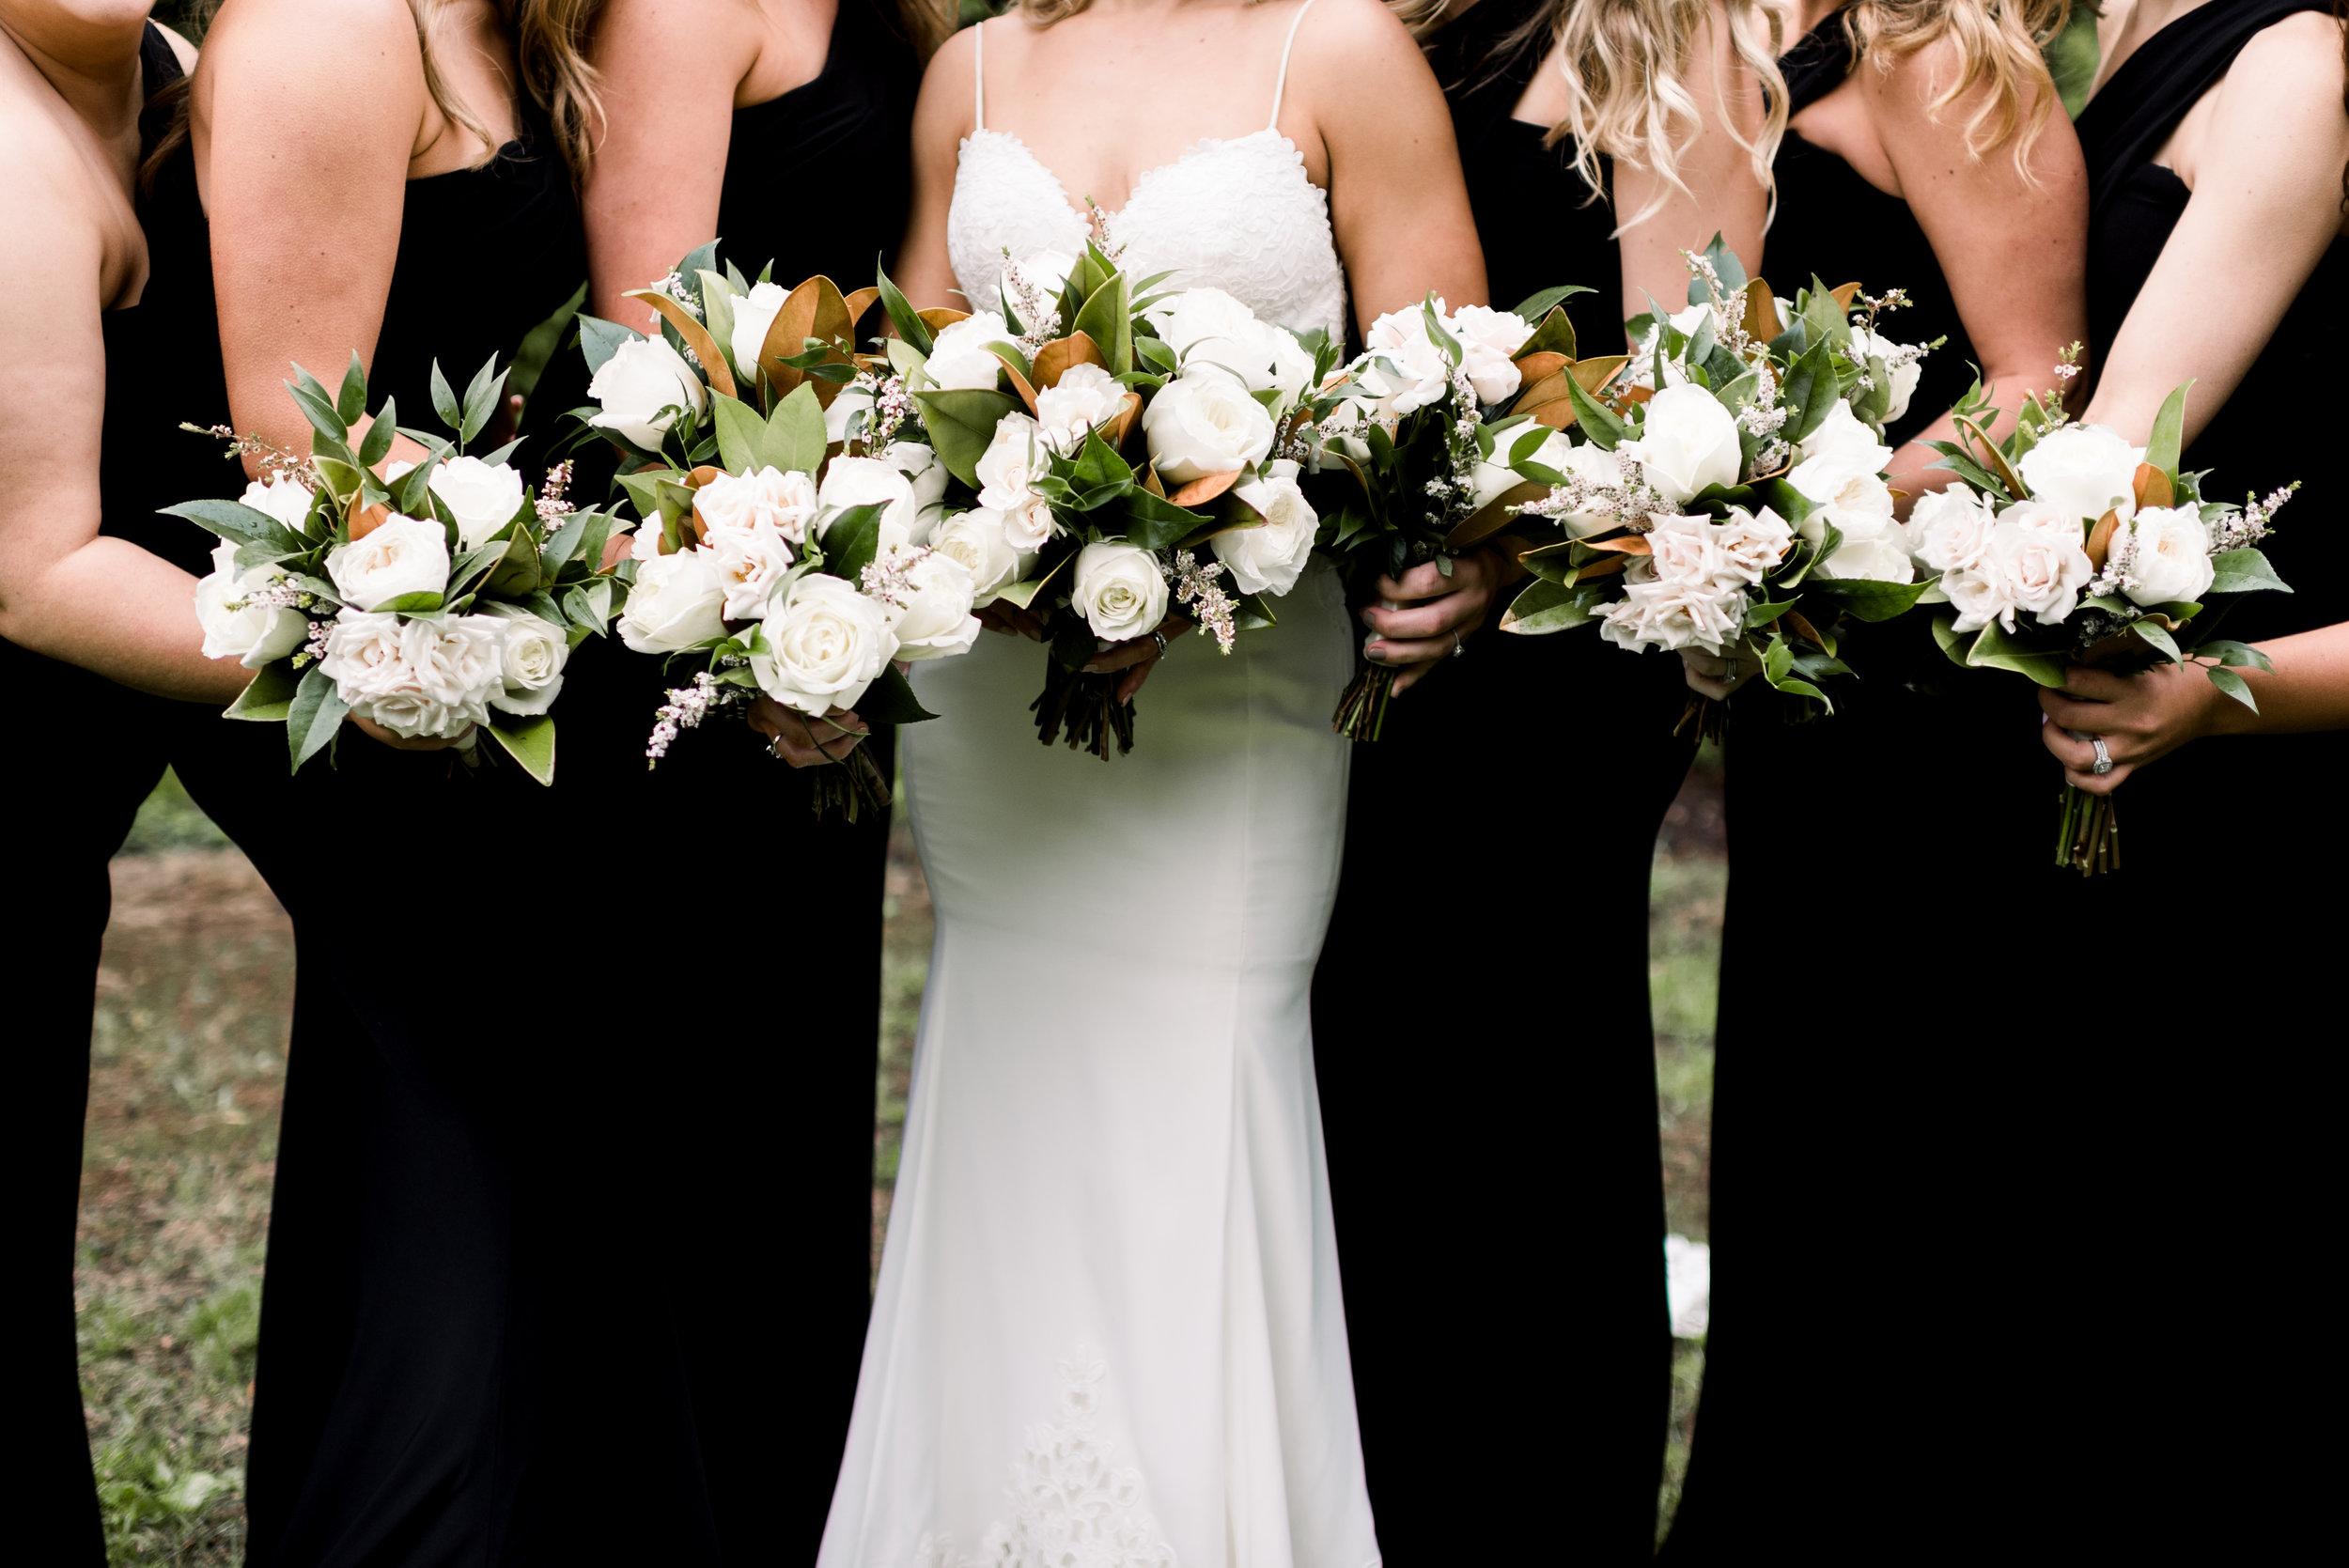 Copy of BridalParty-10.jpg